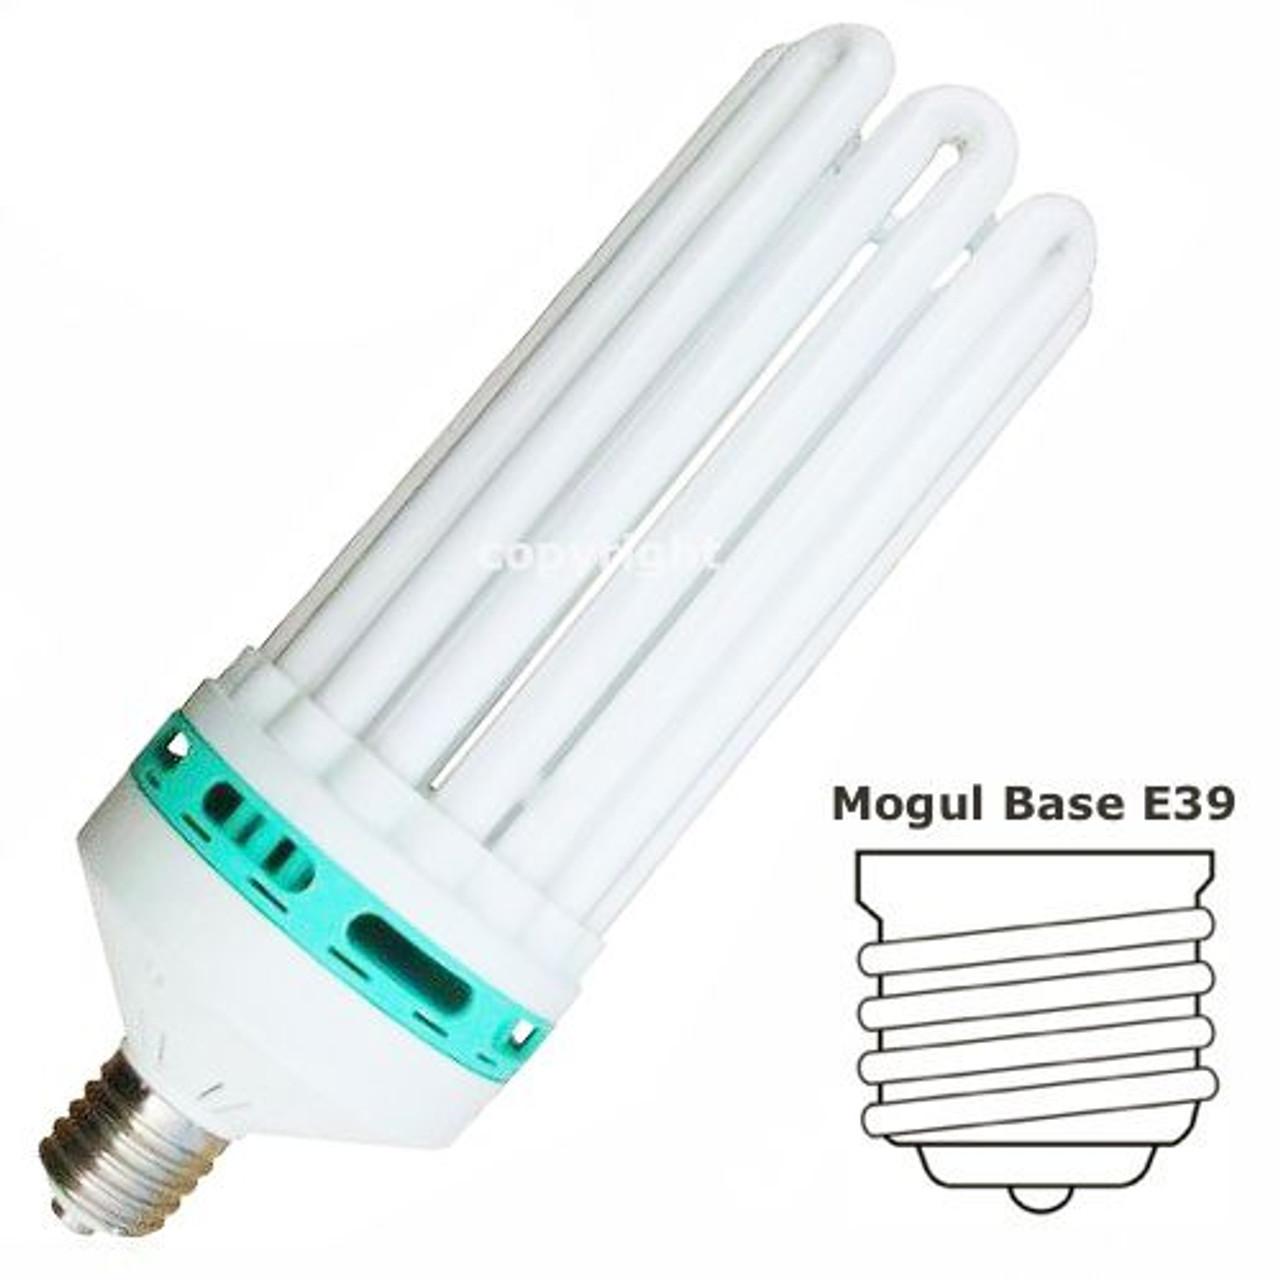 Feliz 250w Blue Cfl Plant Growth Light Bulb 6500k Ilighting Com